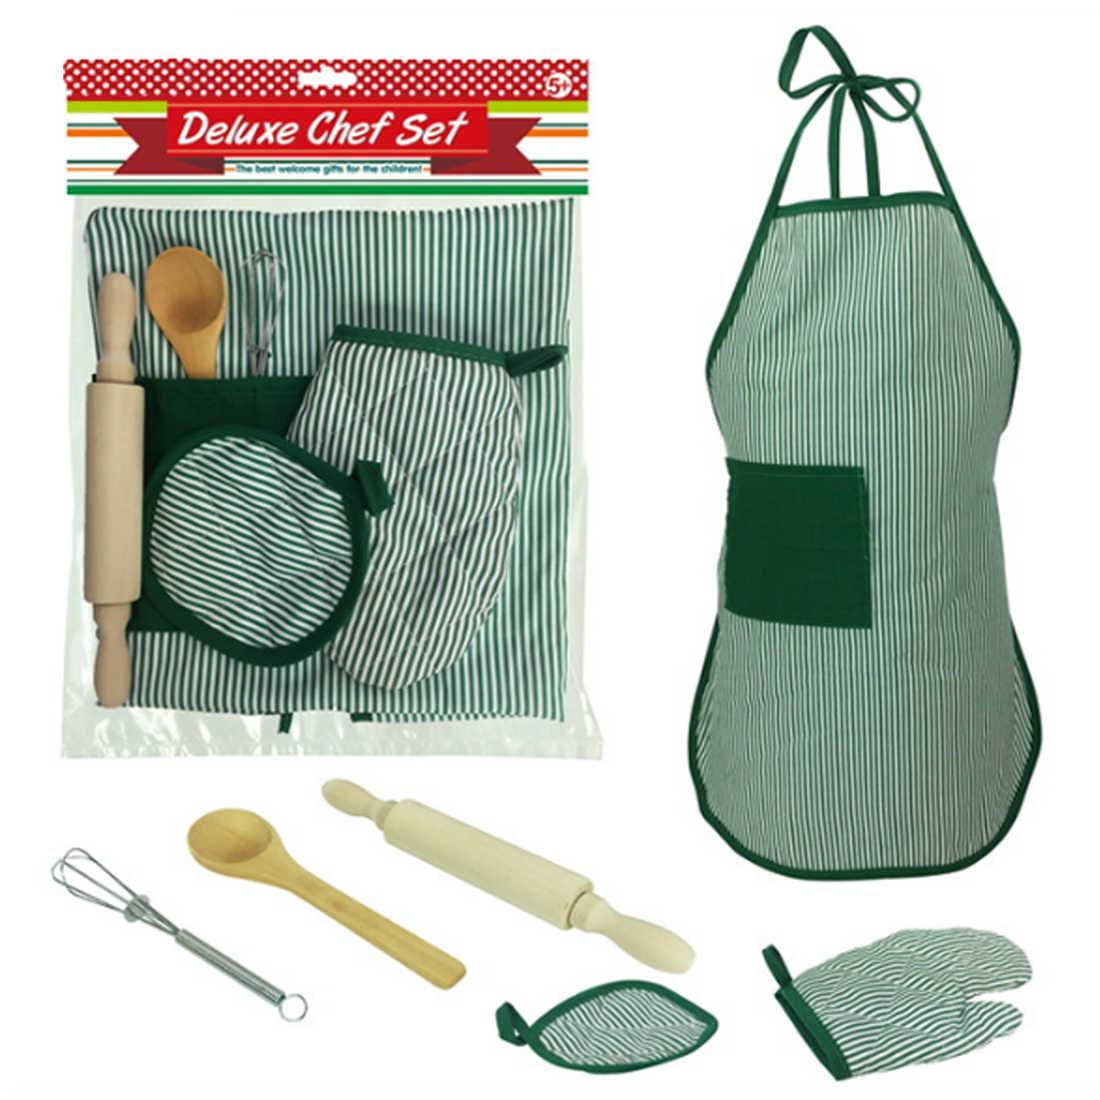 2018 Anak Chef Set DIY Memasak Baking Sesuai dengan Mainan Baru Berpura-pura Bermain Apron Sarung Tangan Rolling Pin Eggbeater Cooker Hadiah untuk Anak-anak